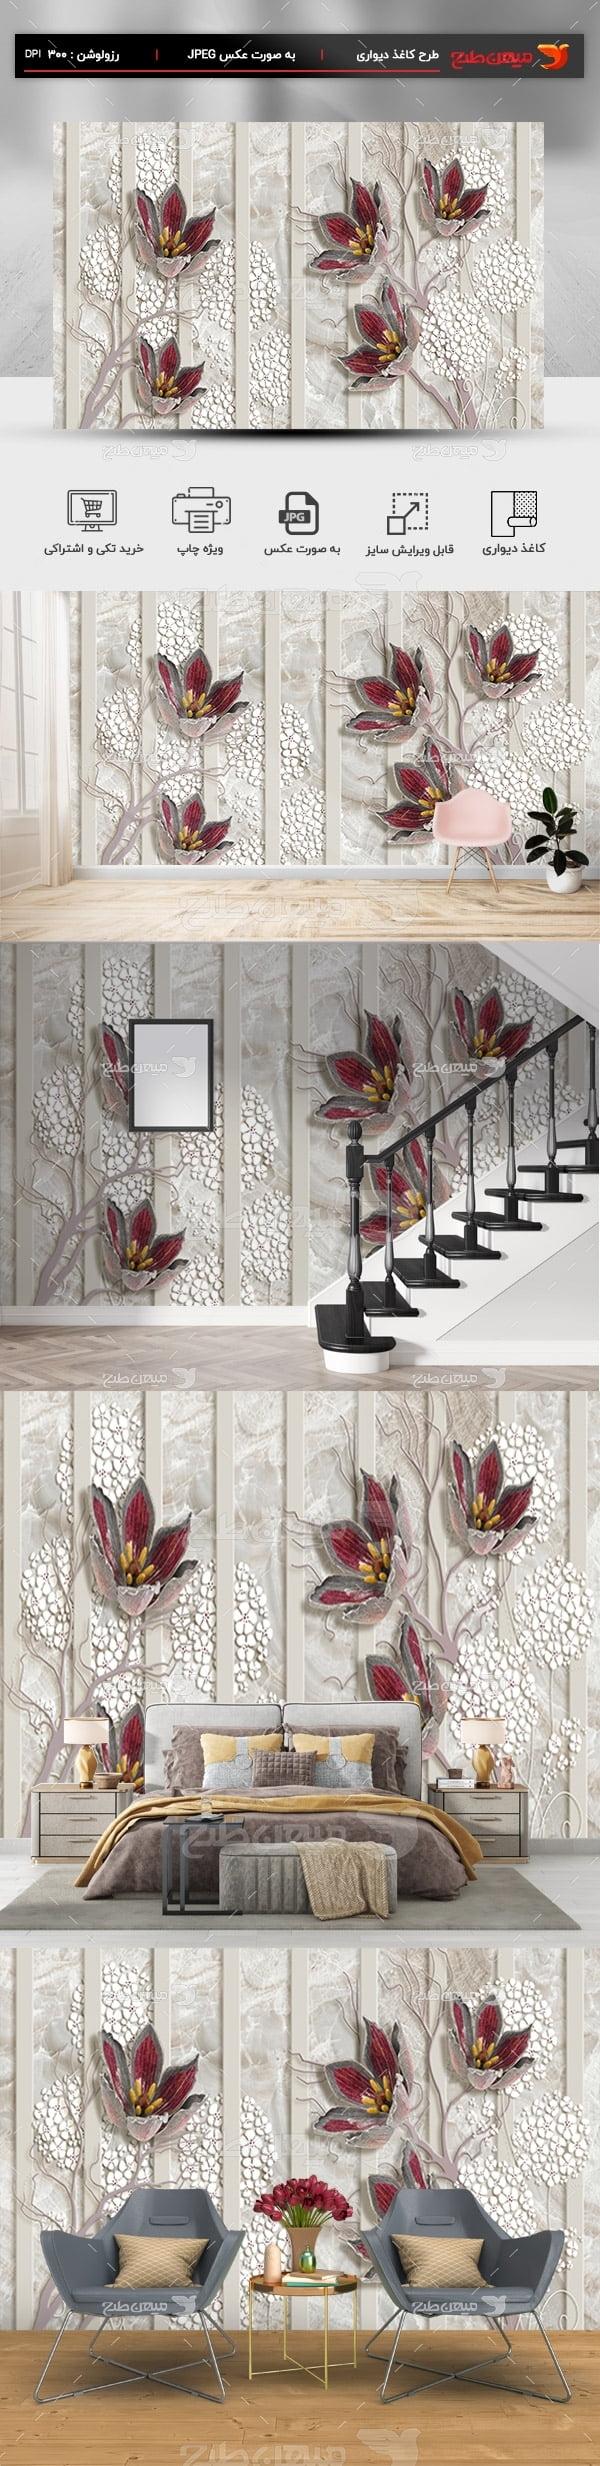 پوستر کاغذ دیواری سه بعدی خاکستری و گل زرشکی